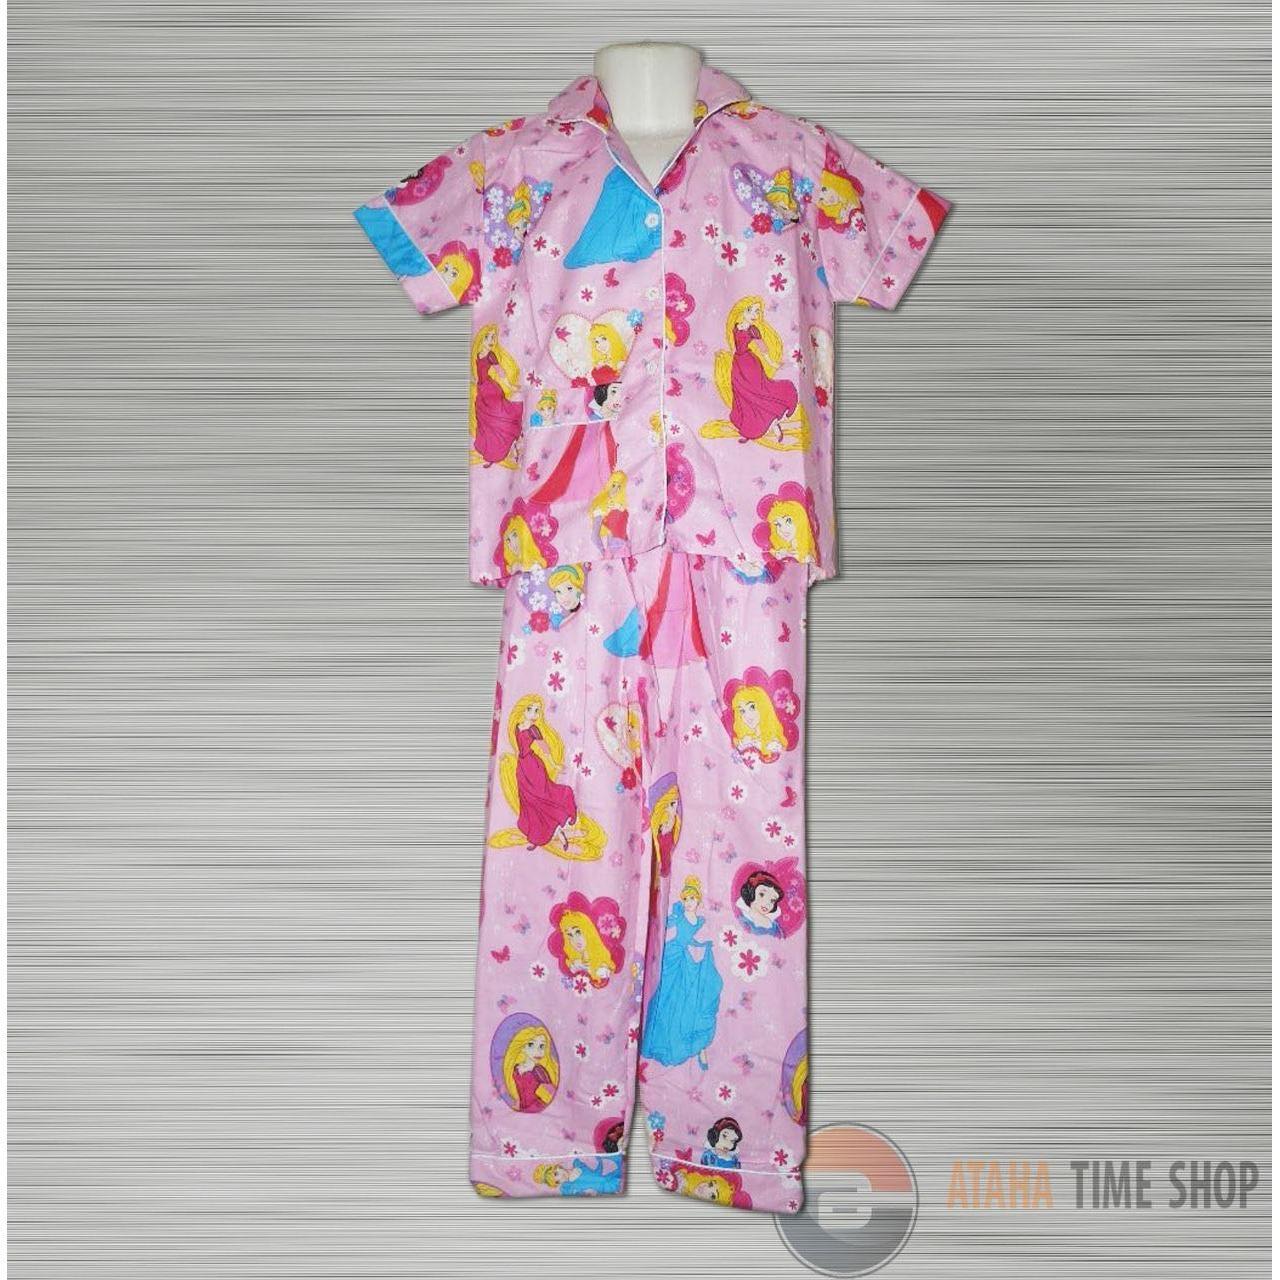 Baju Tidur Anak Gambar FROZEN ( 4-7 Tahun)